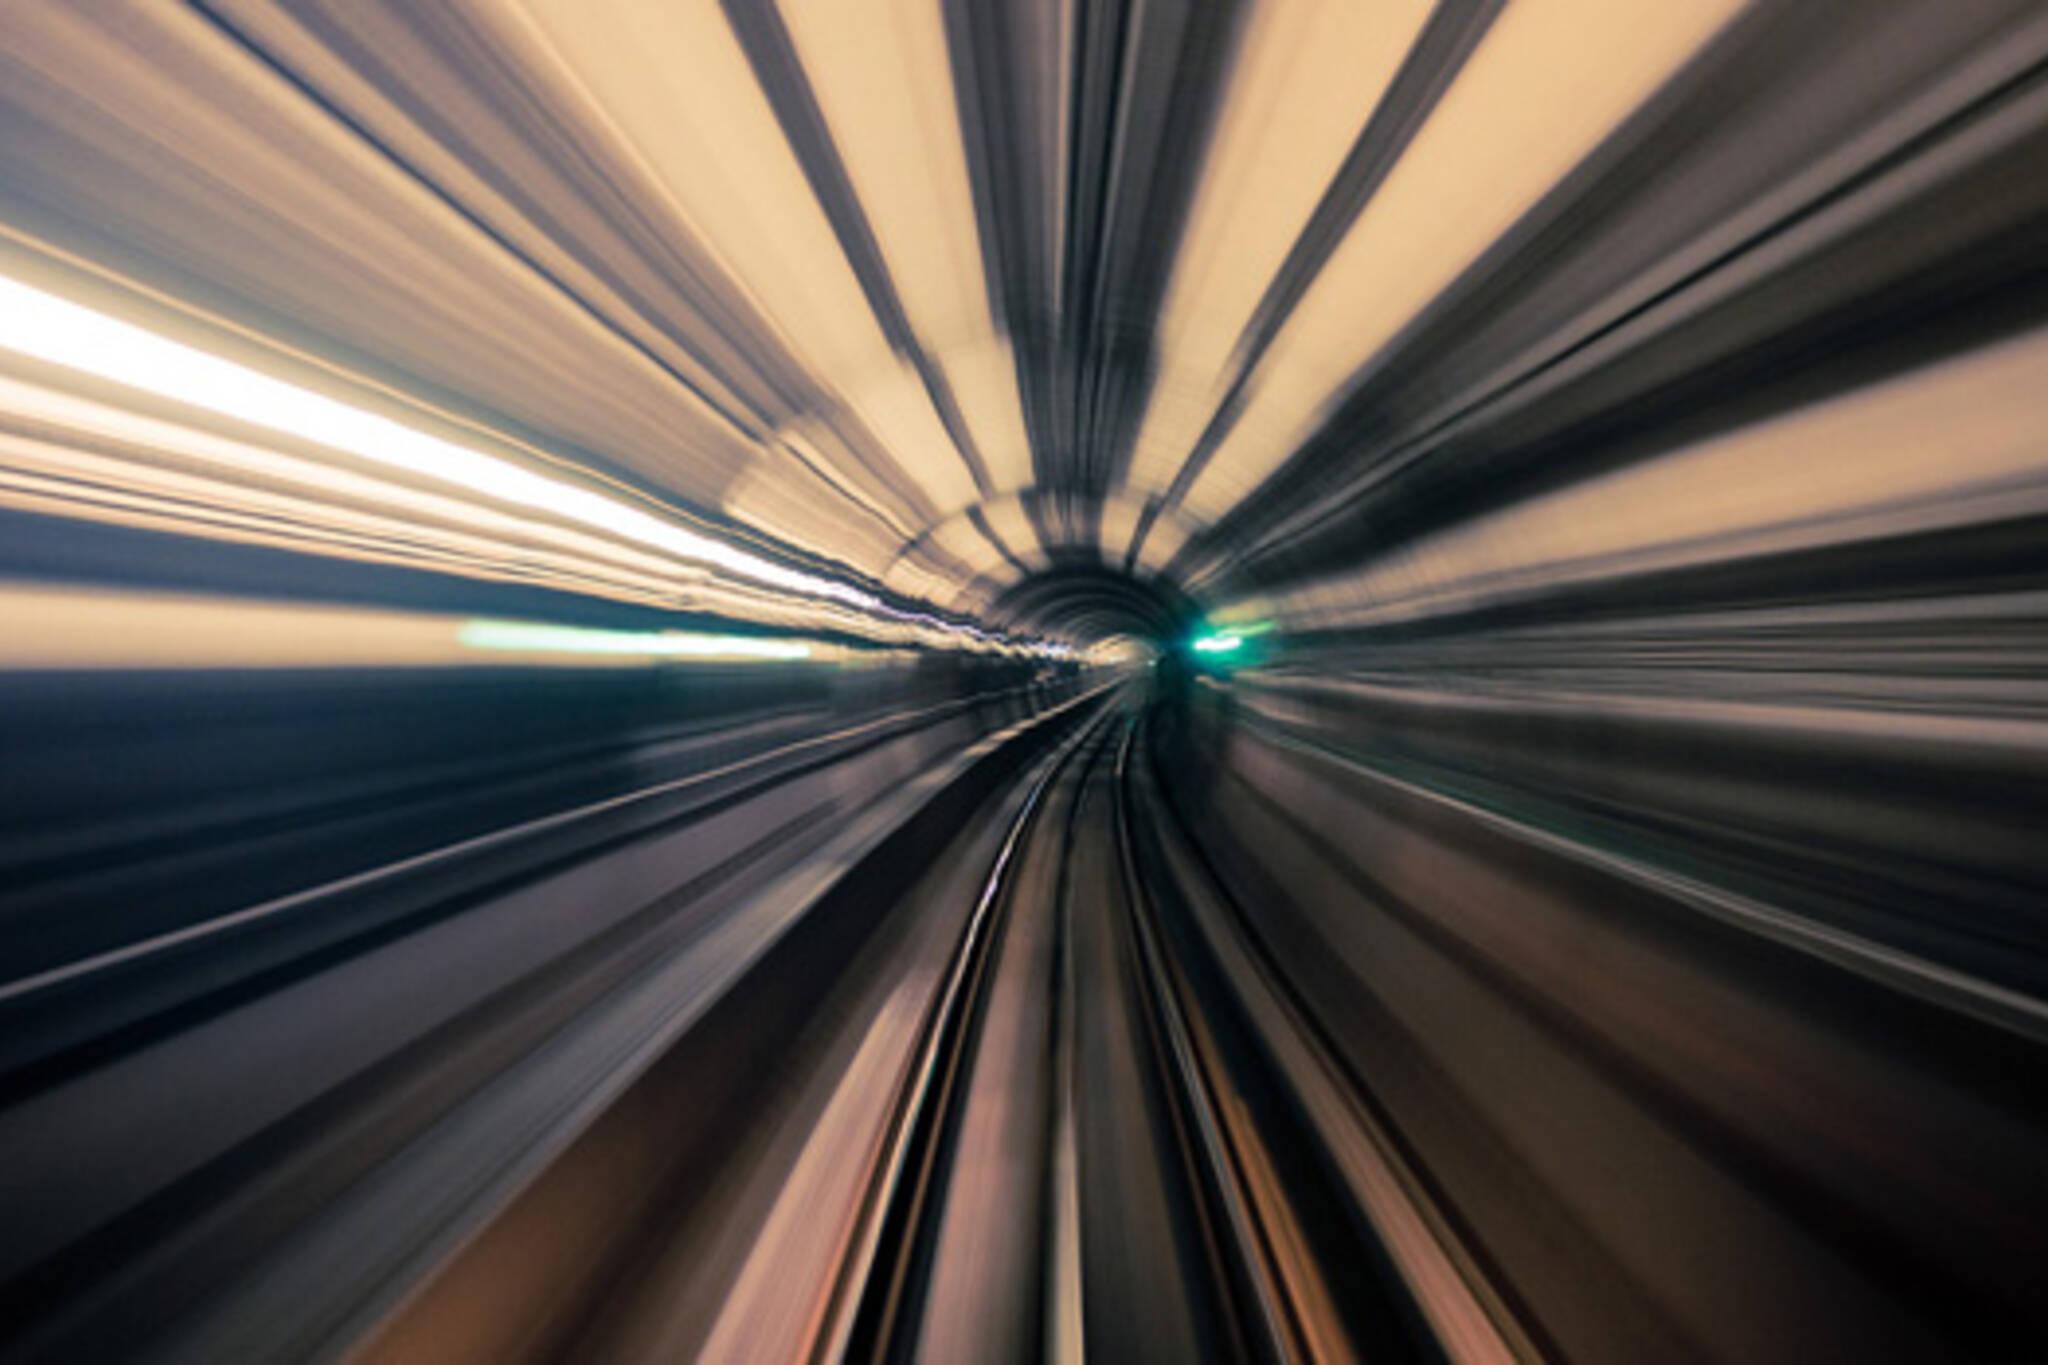 TTC tunnel photograph